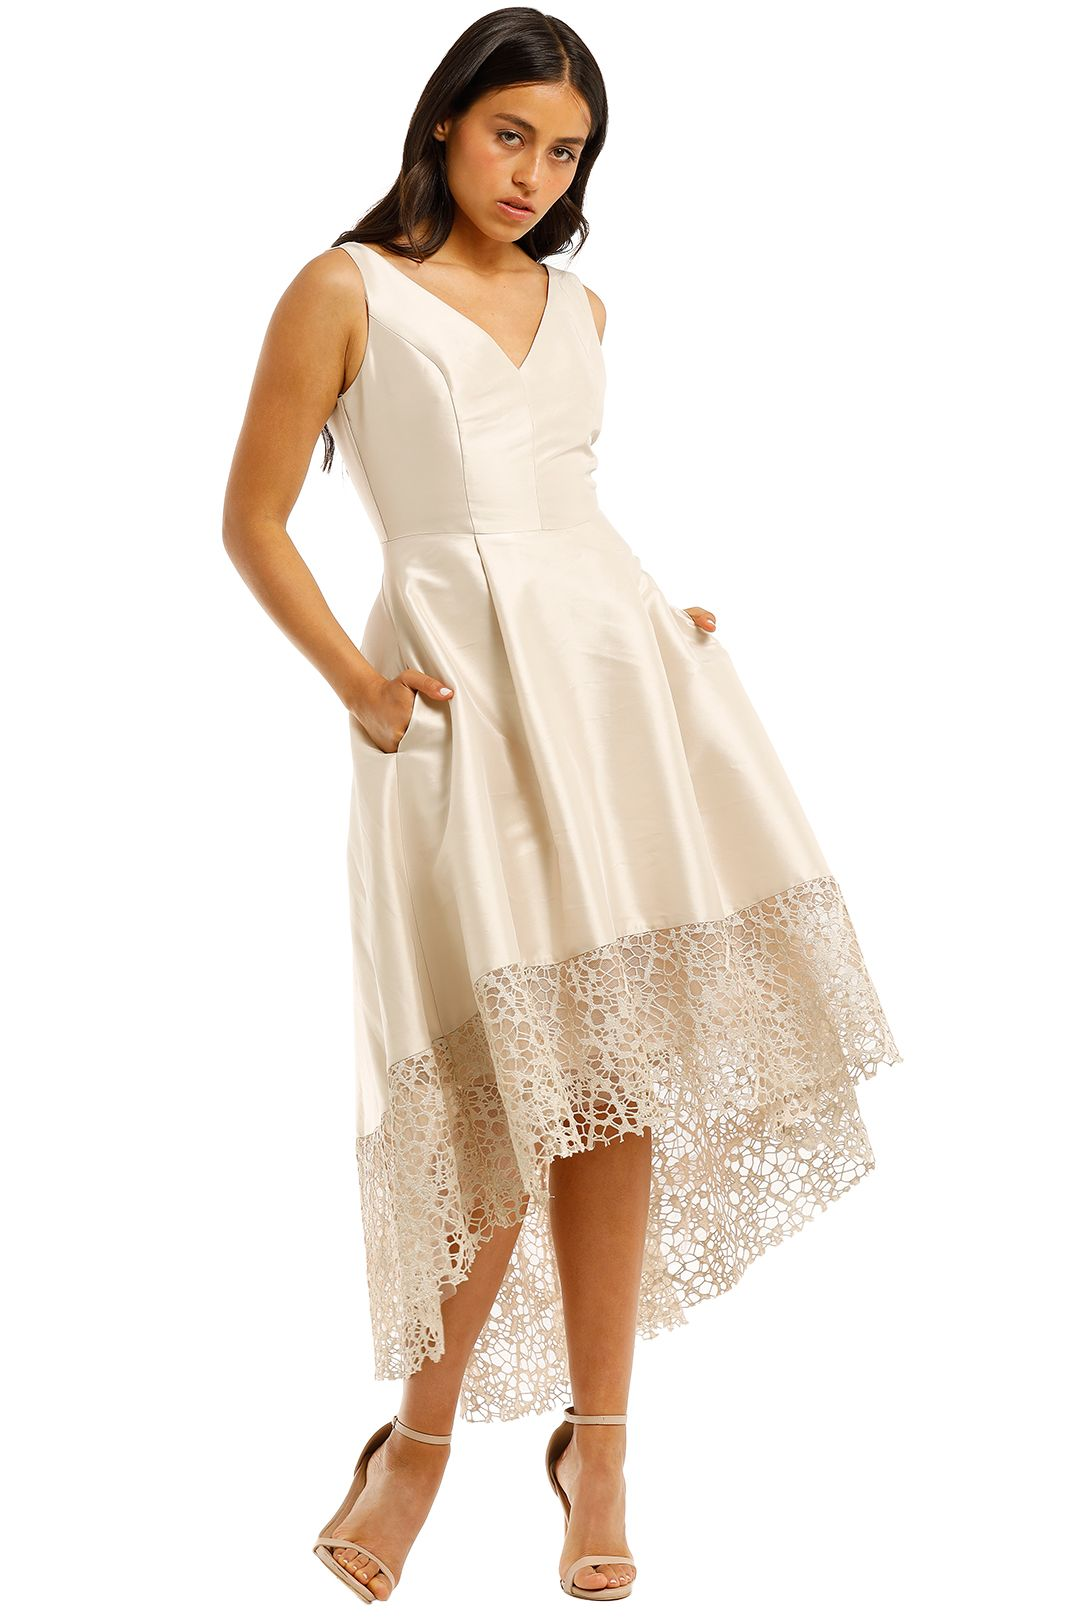 Anthea-Crawford-Satin-Hi-Lo-Dress-Lustre-Side